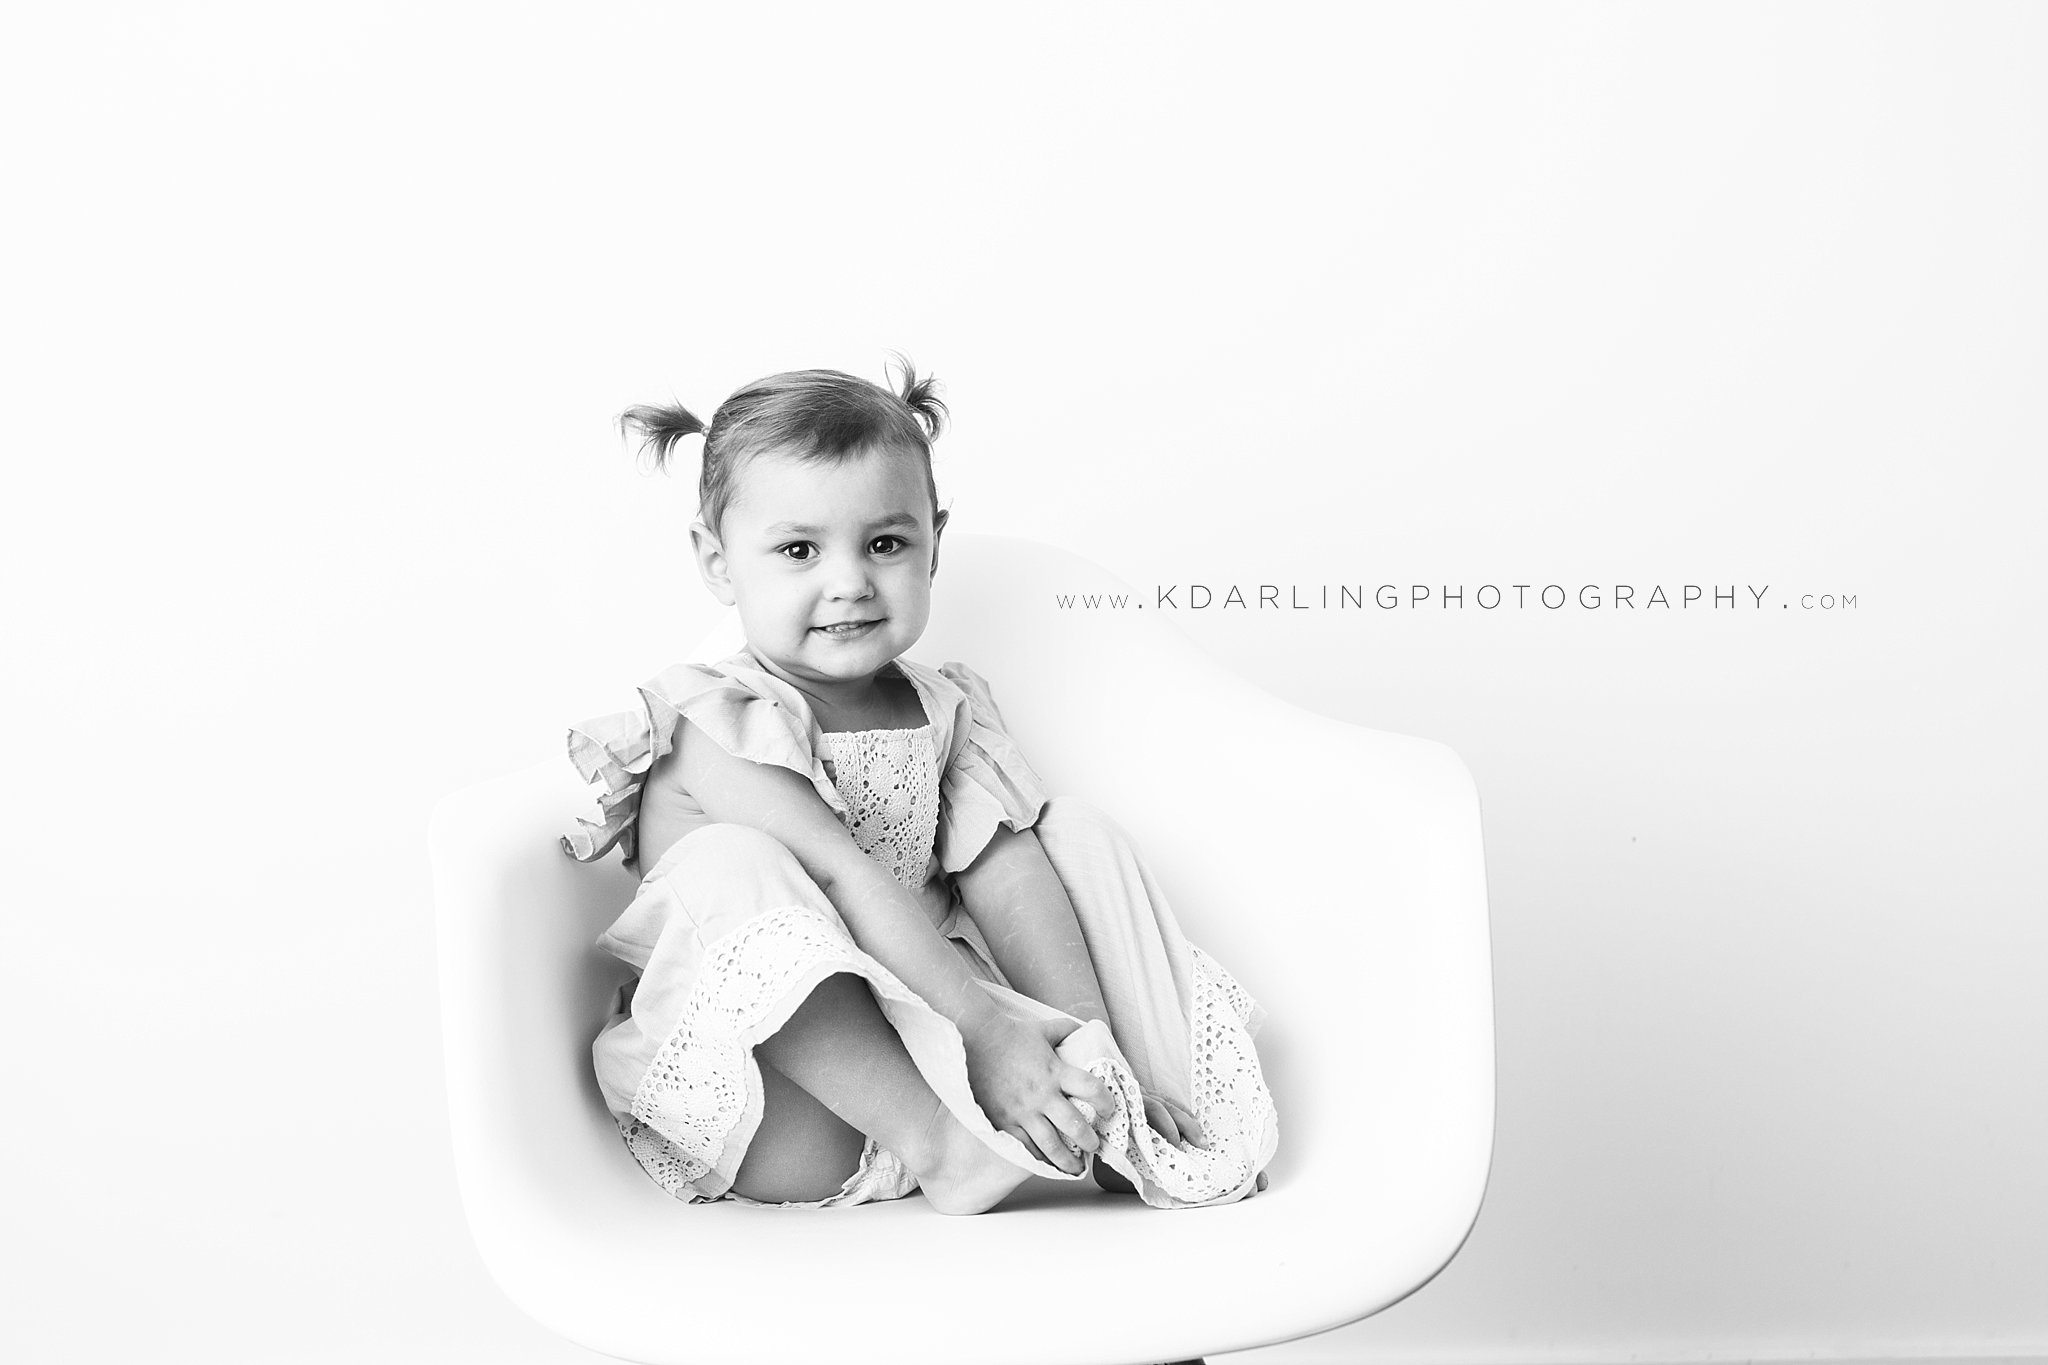 Child-Photographer-portraits-Champaign-County-IL-Fisher-Studio-Darling_0180.jpg